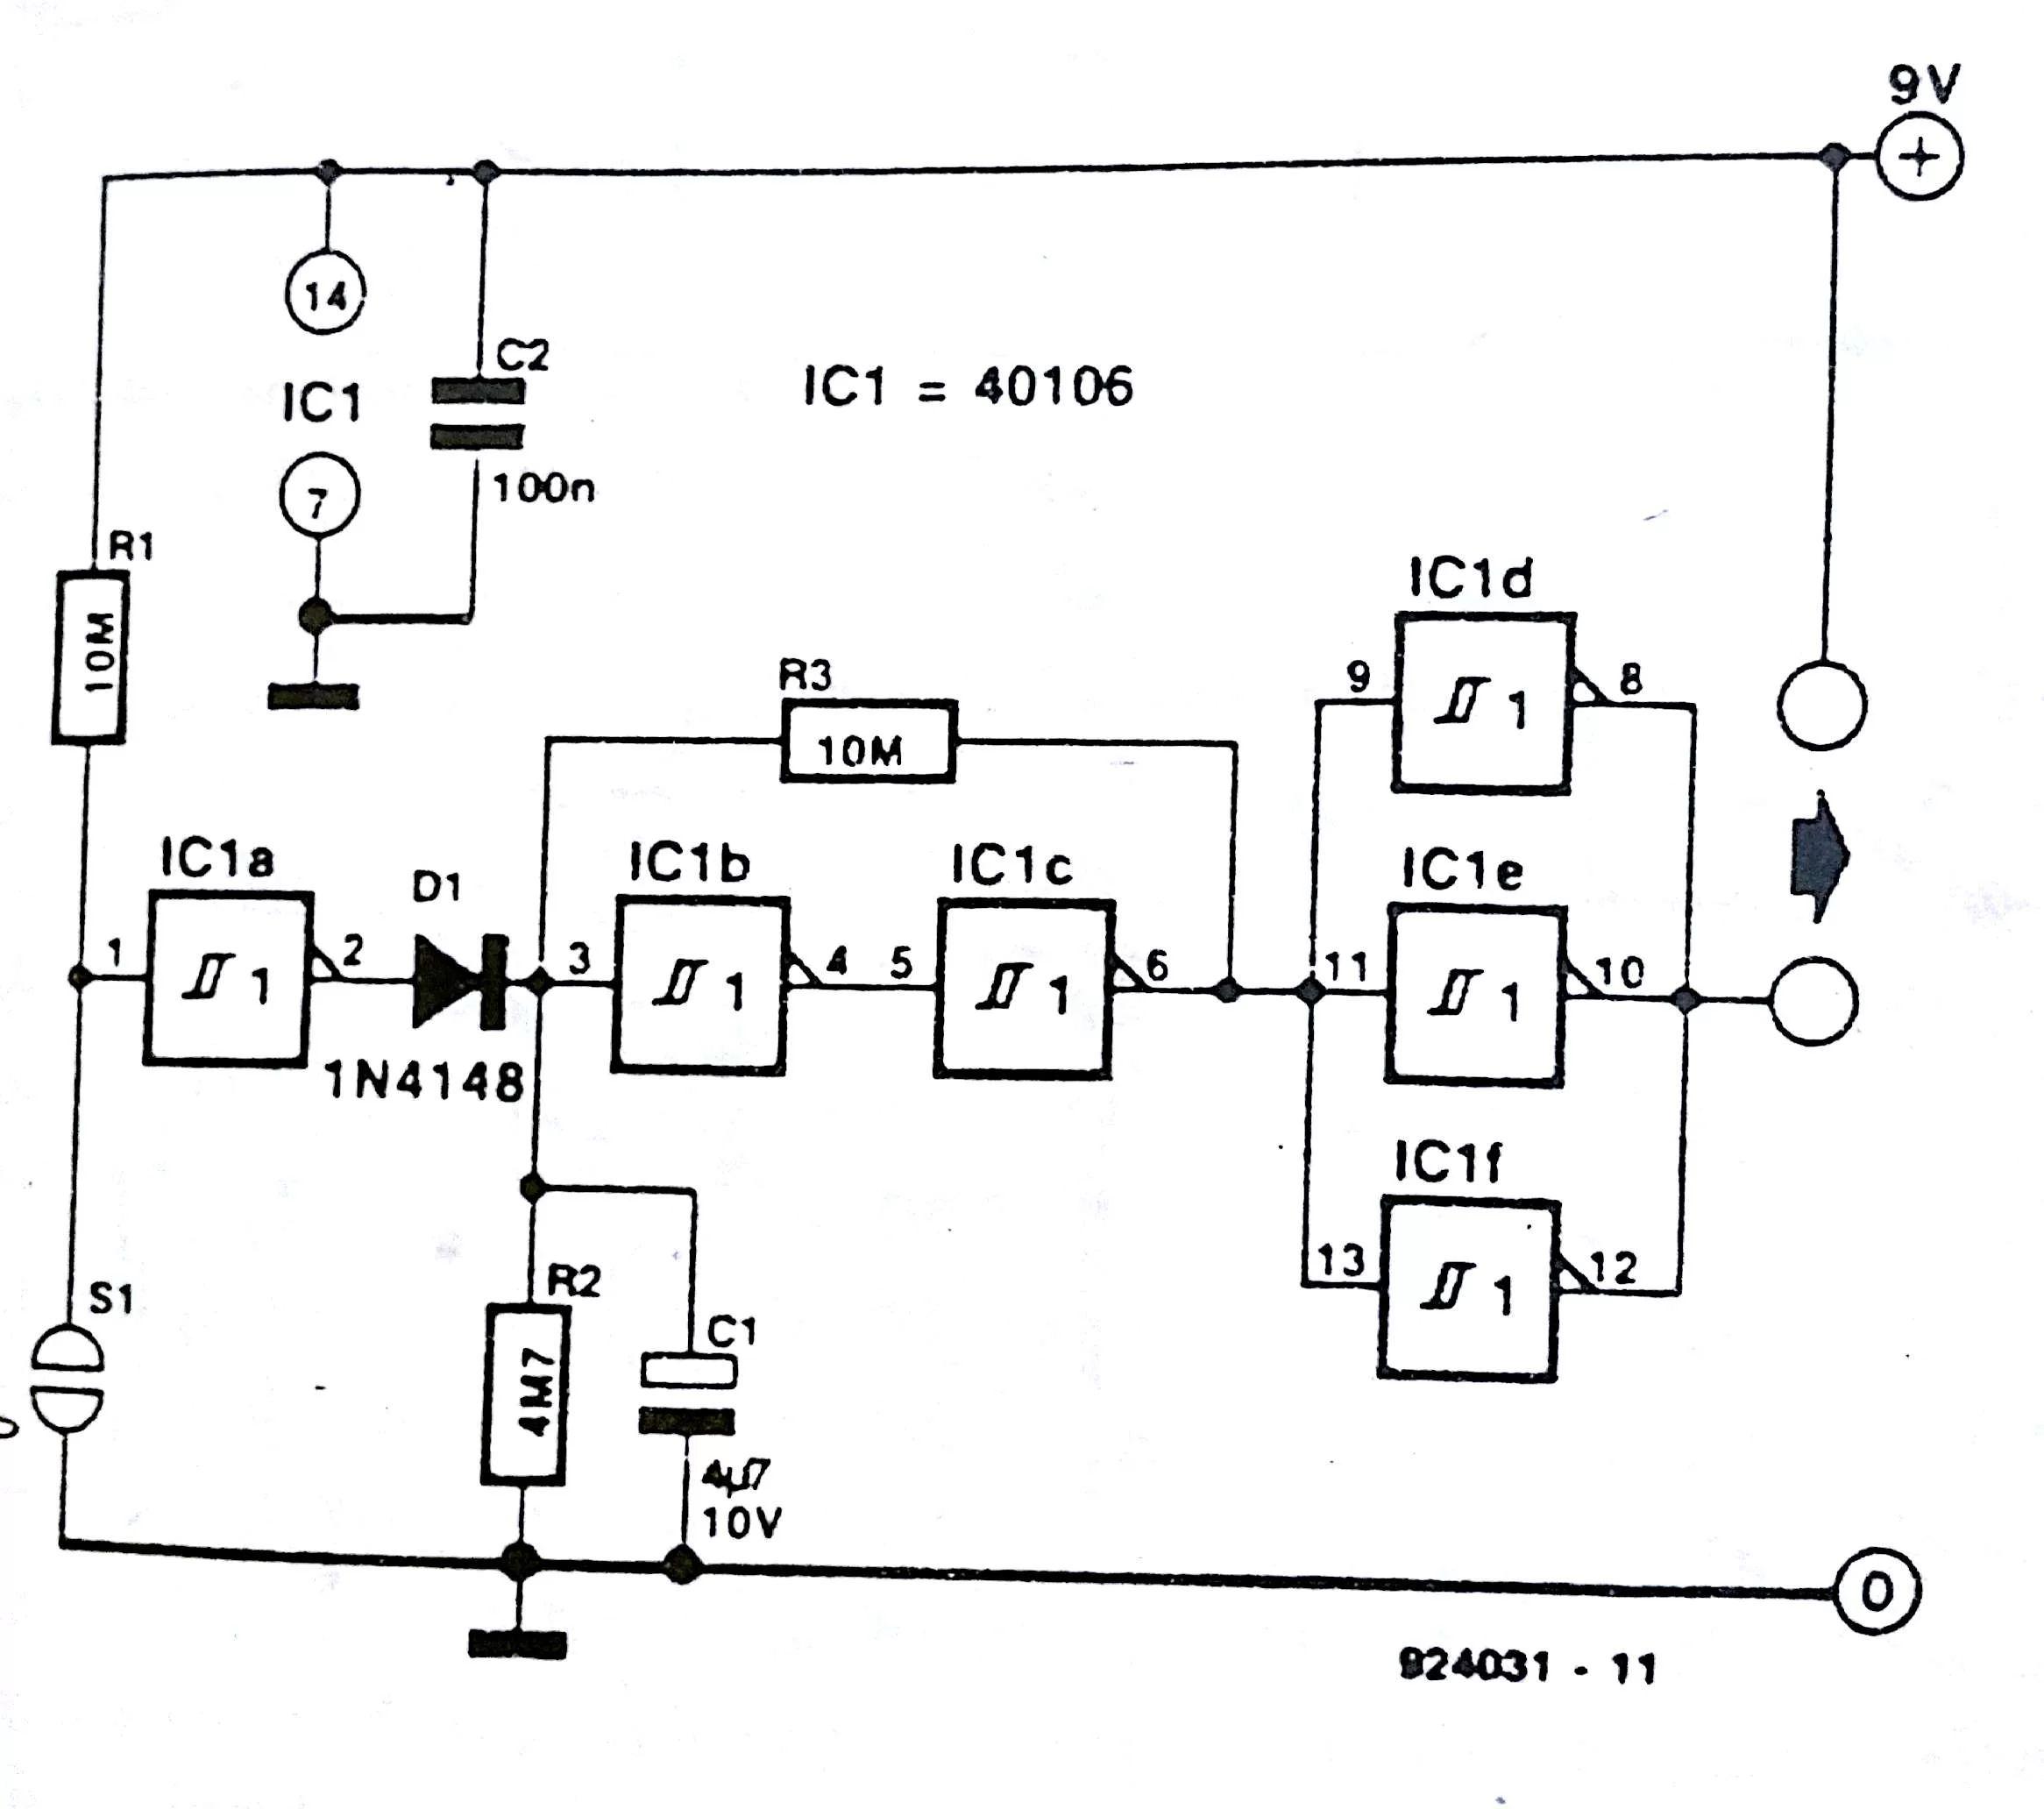 off main sub panel wiring diagram off circuit diagrams